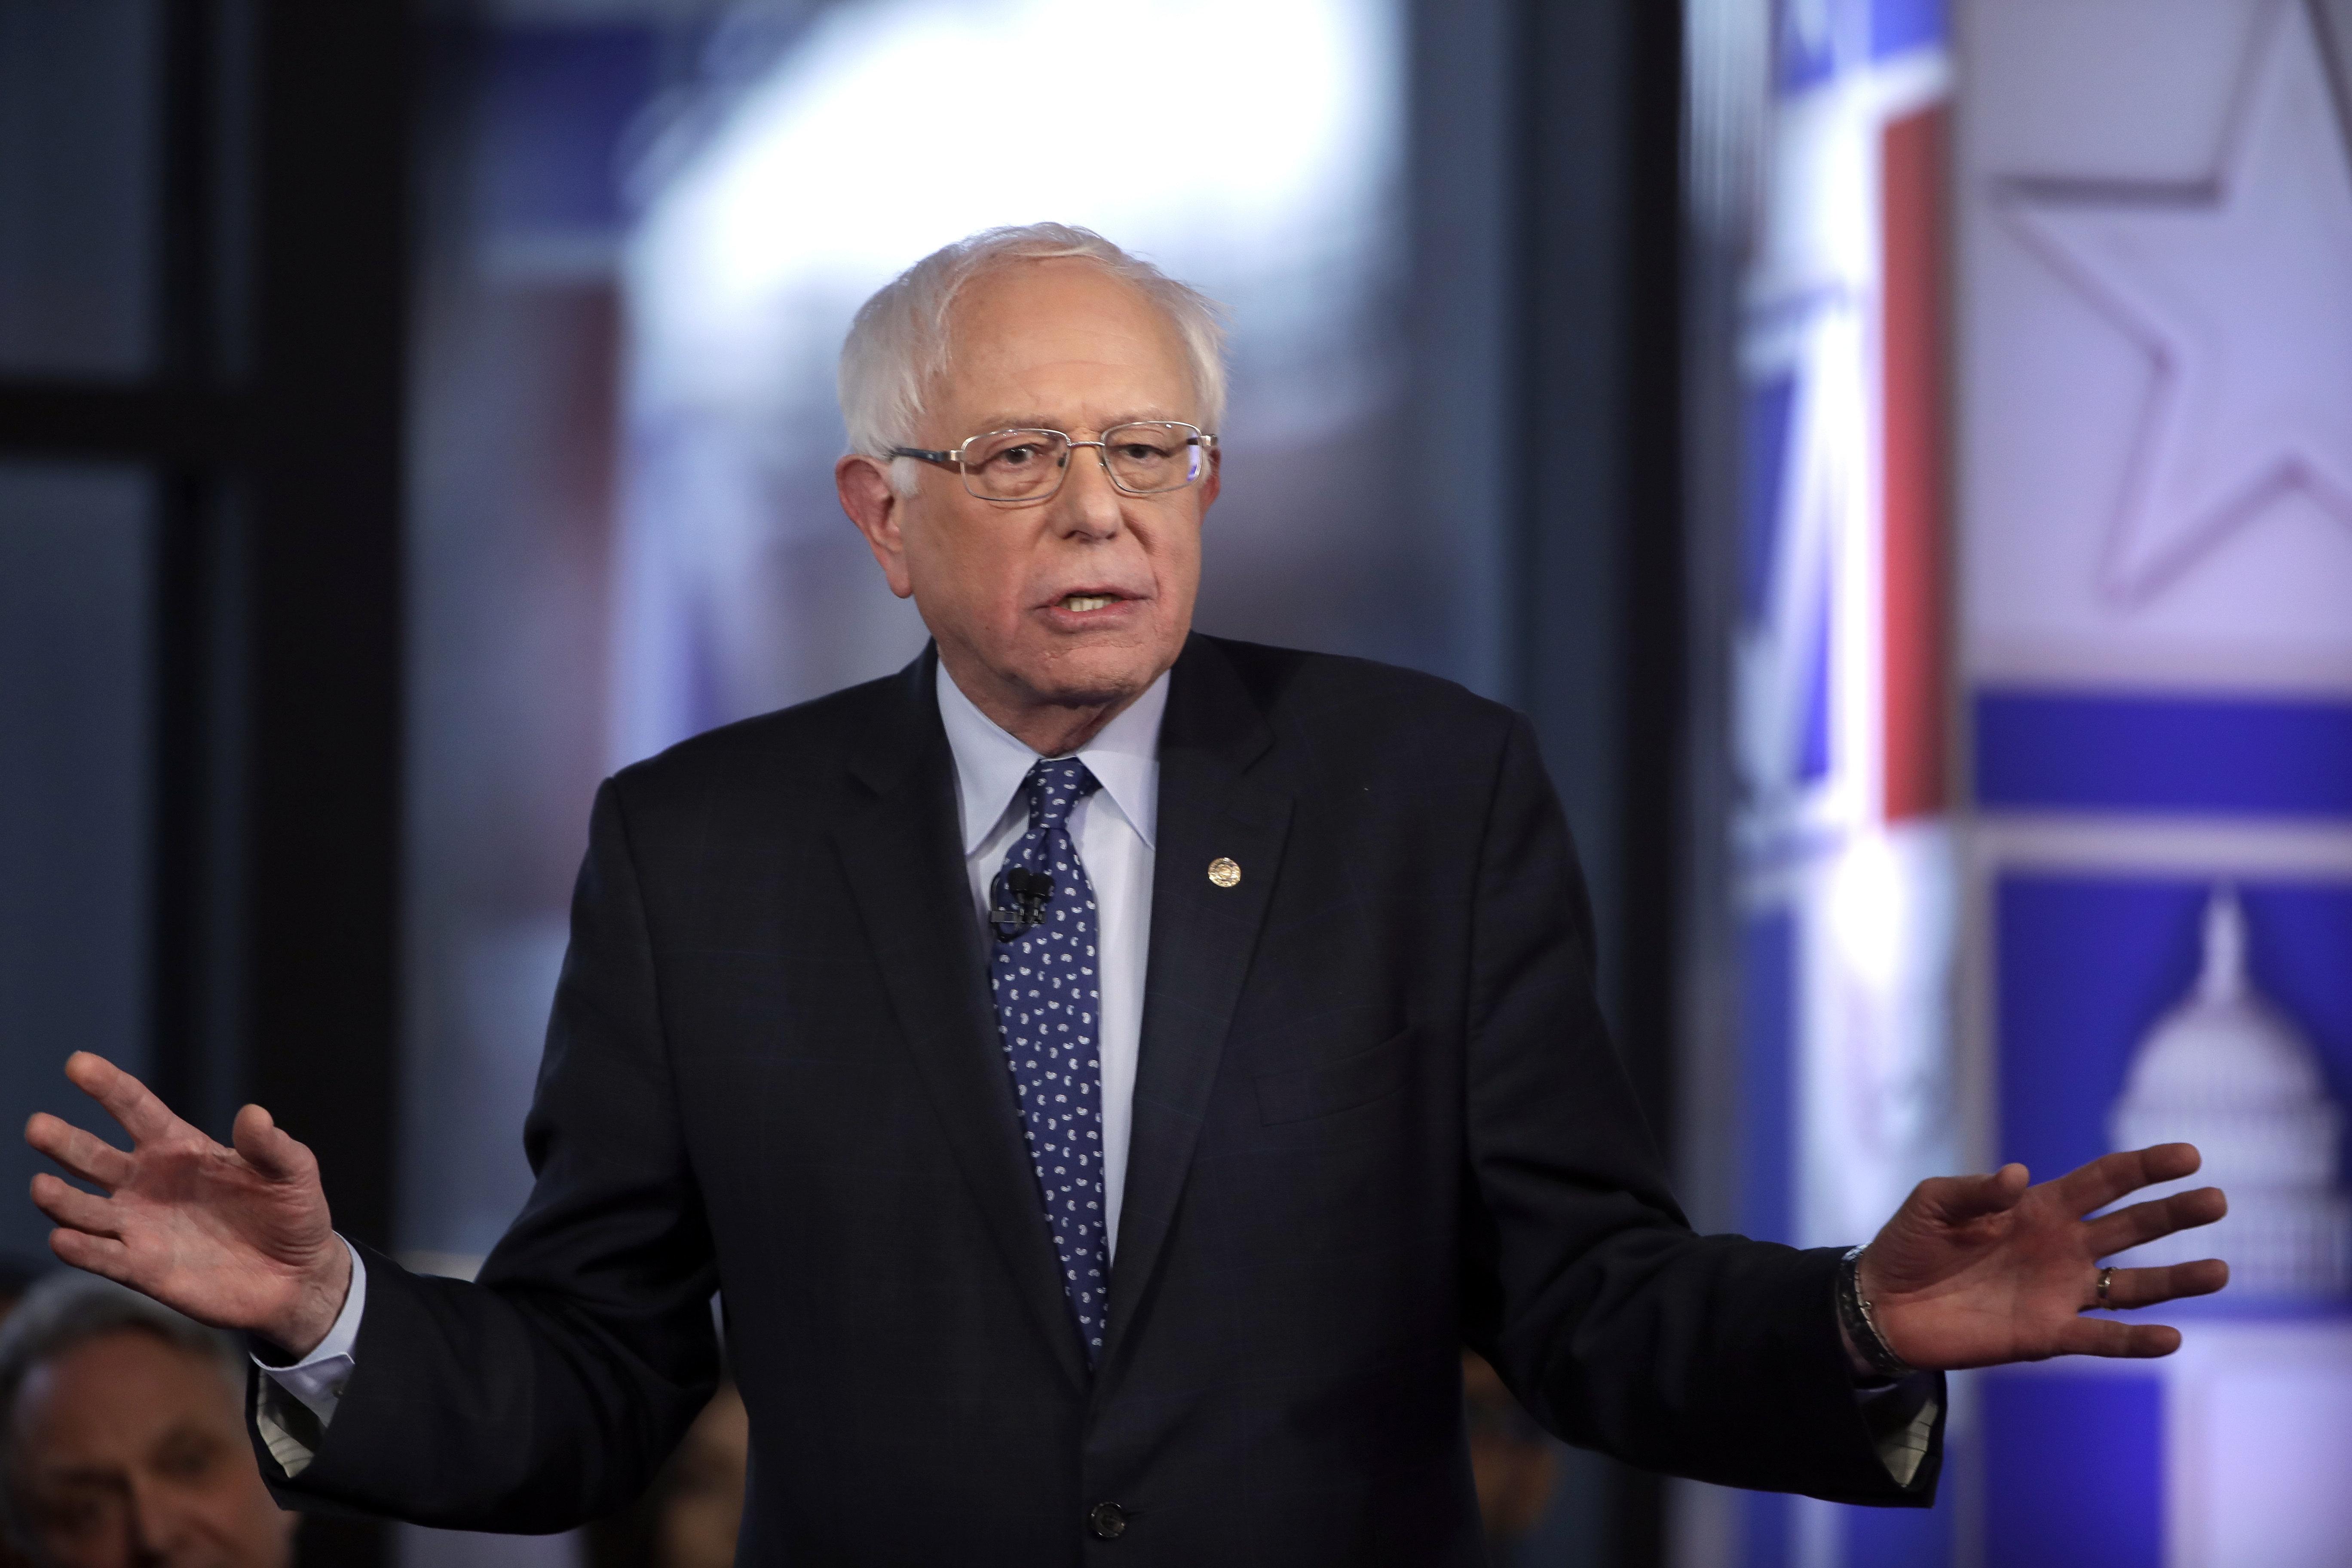 Sen. Bernie Sanders (I-Vt.) speaks during a Fox News town-hall-style event on Monday in Bethlehem, Pennsylvania.